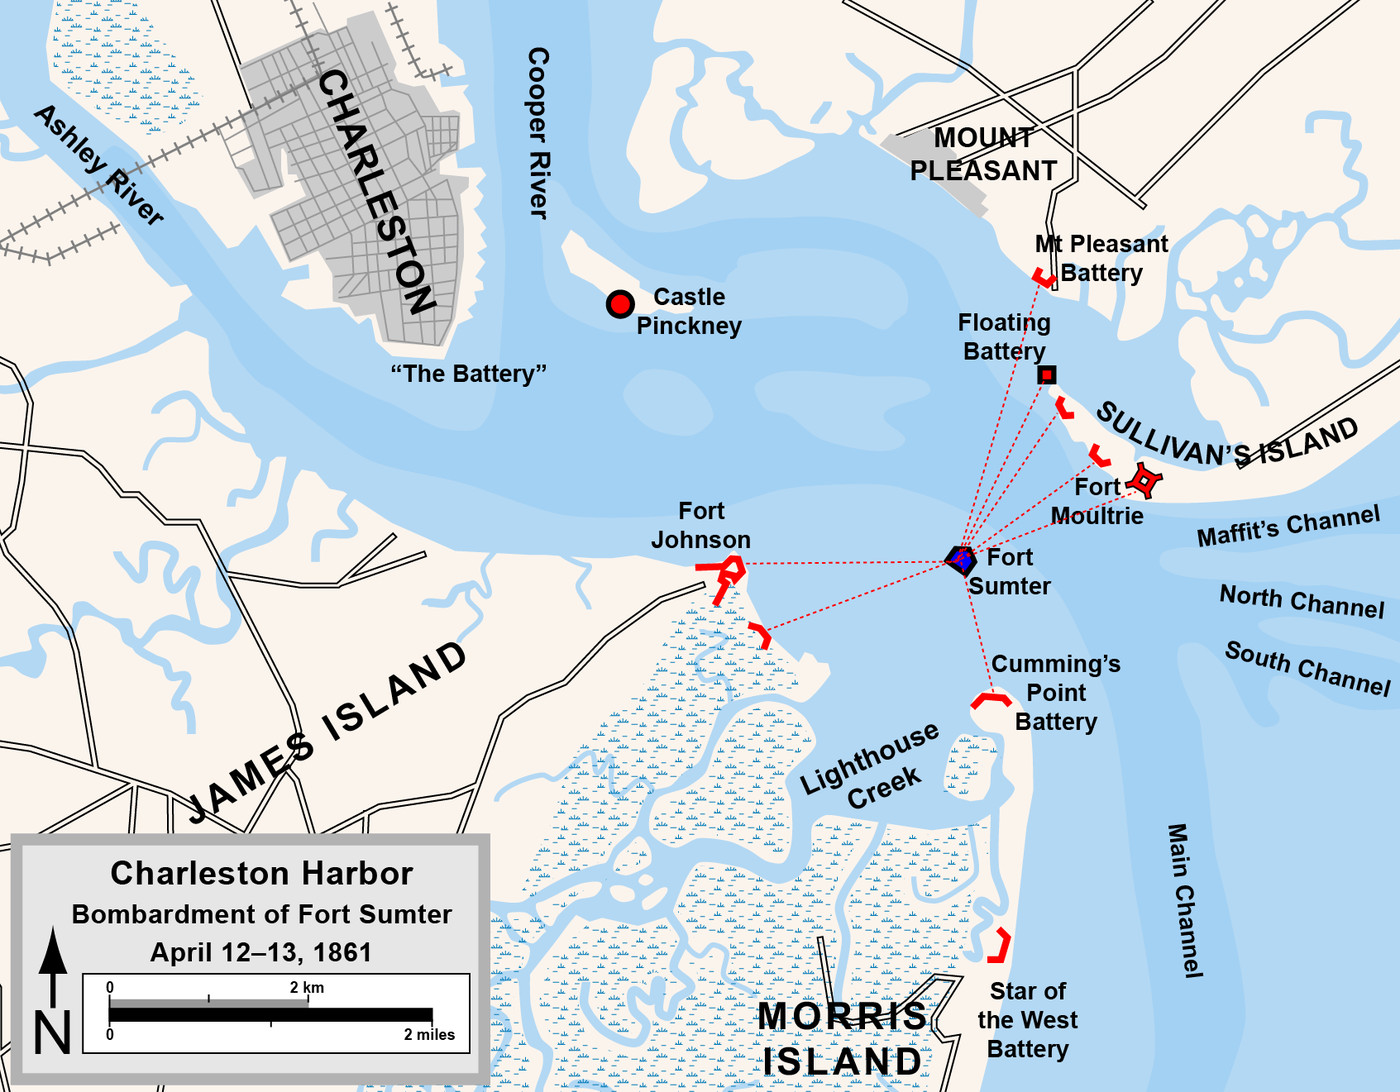 Bombardment of Fort Sumter 1861 Wall Poster Civil War Map Charleston Harbor S.C